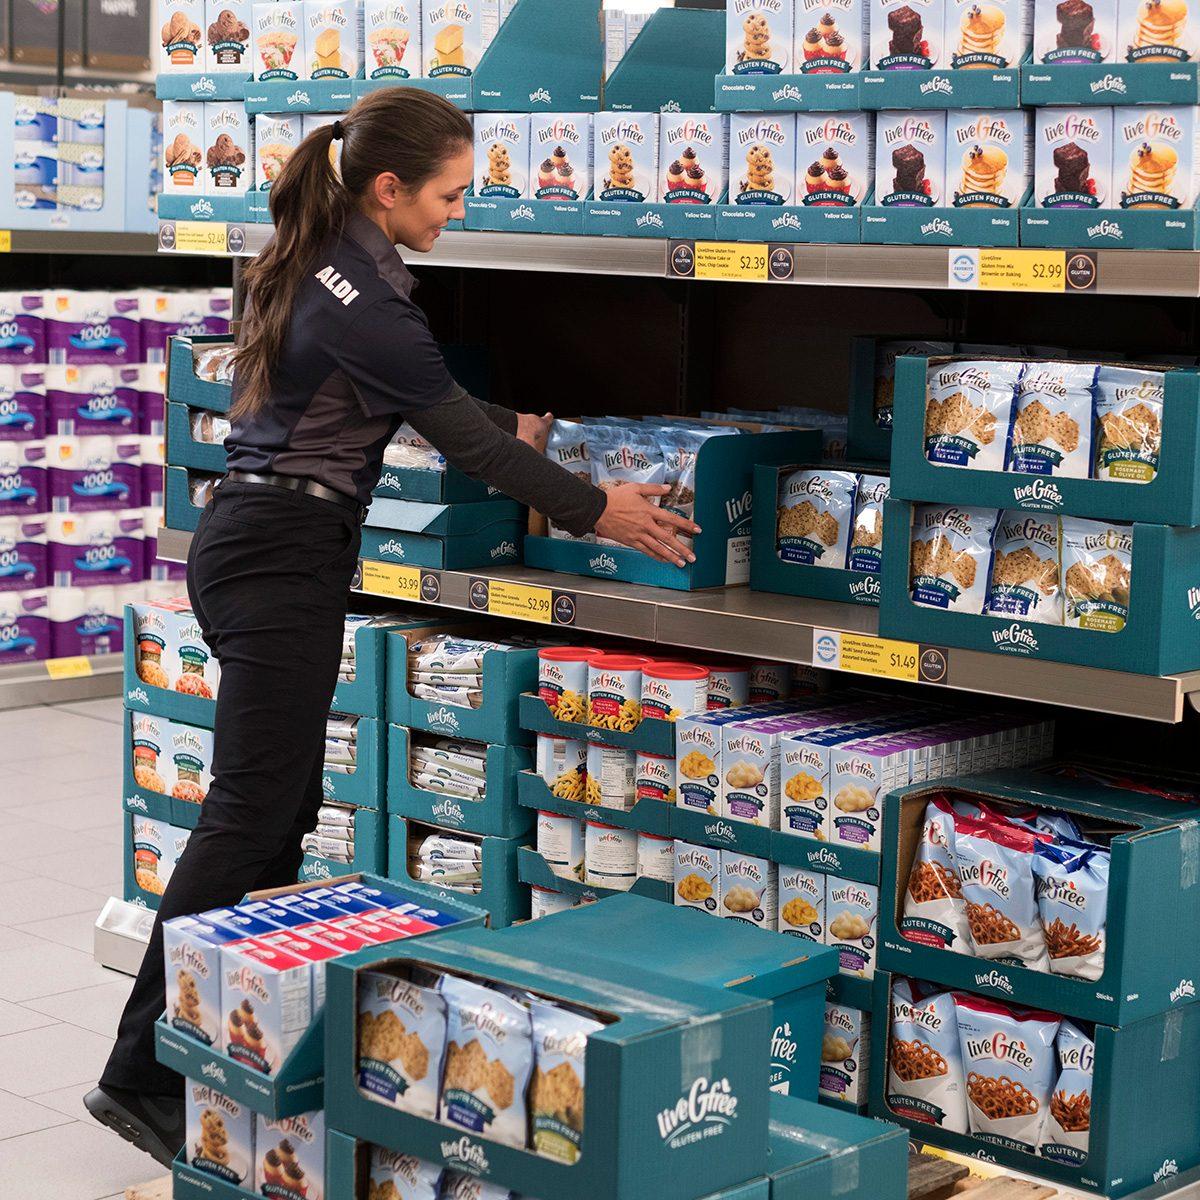 Aldi employee stocking shelves